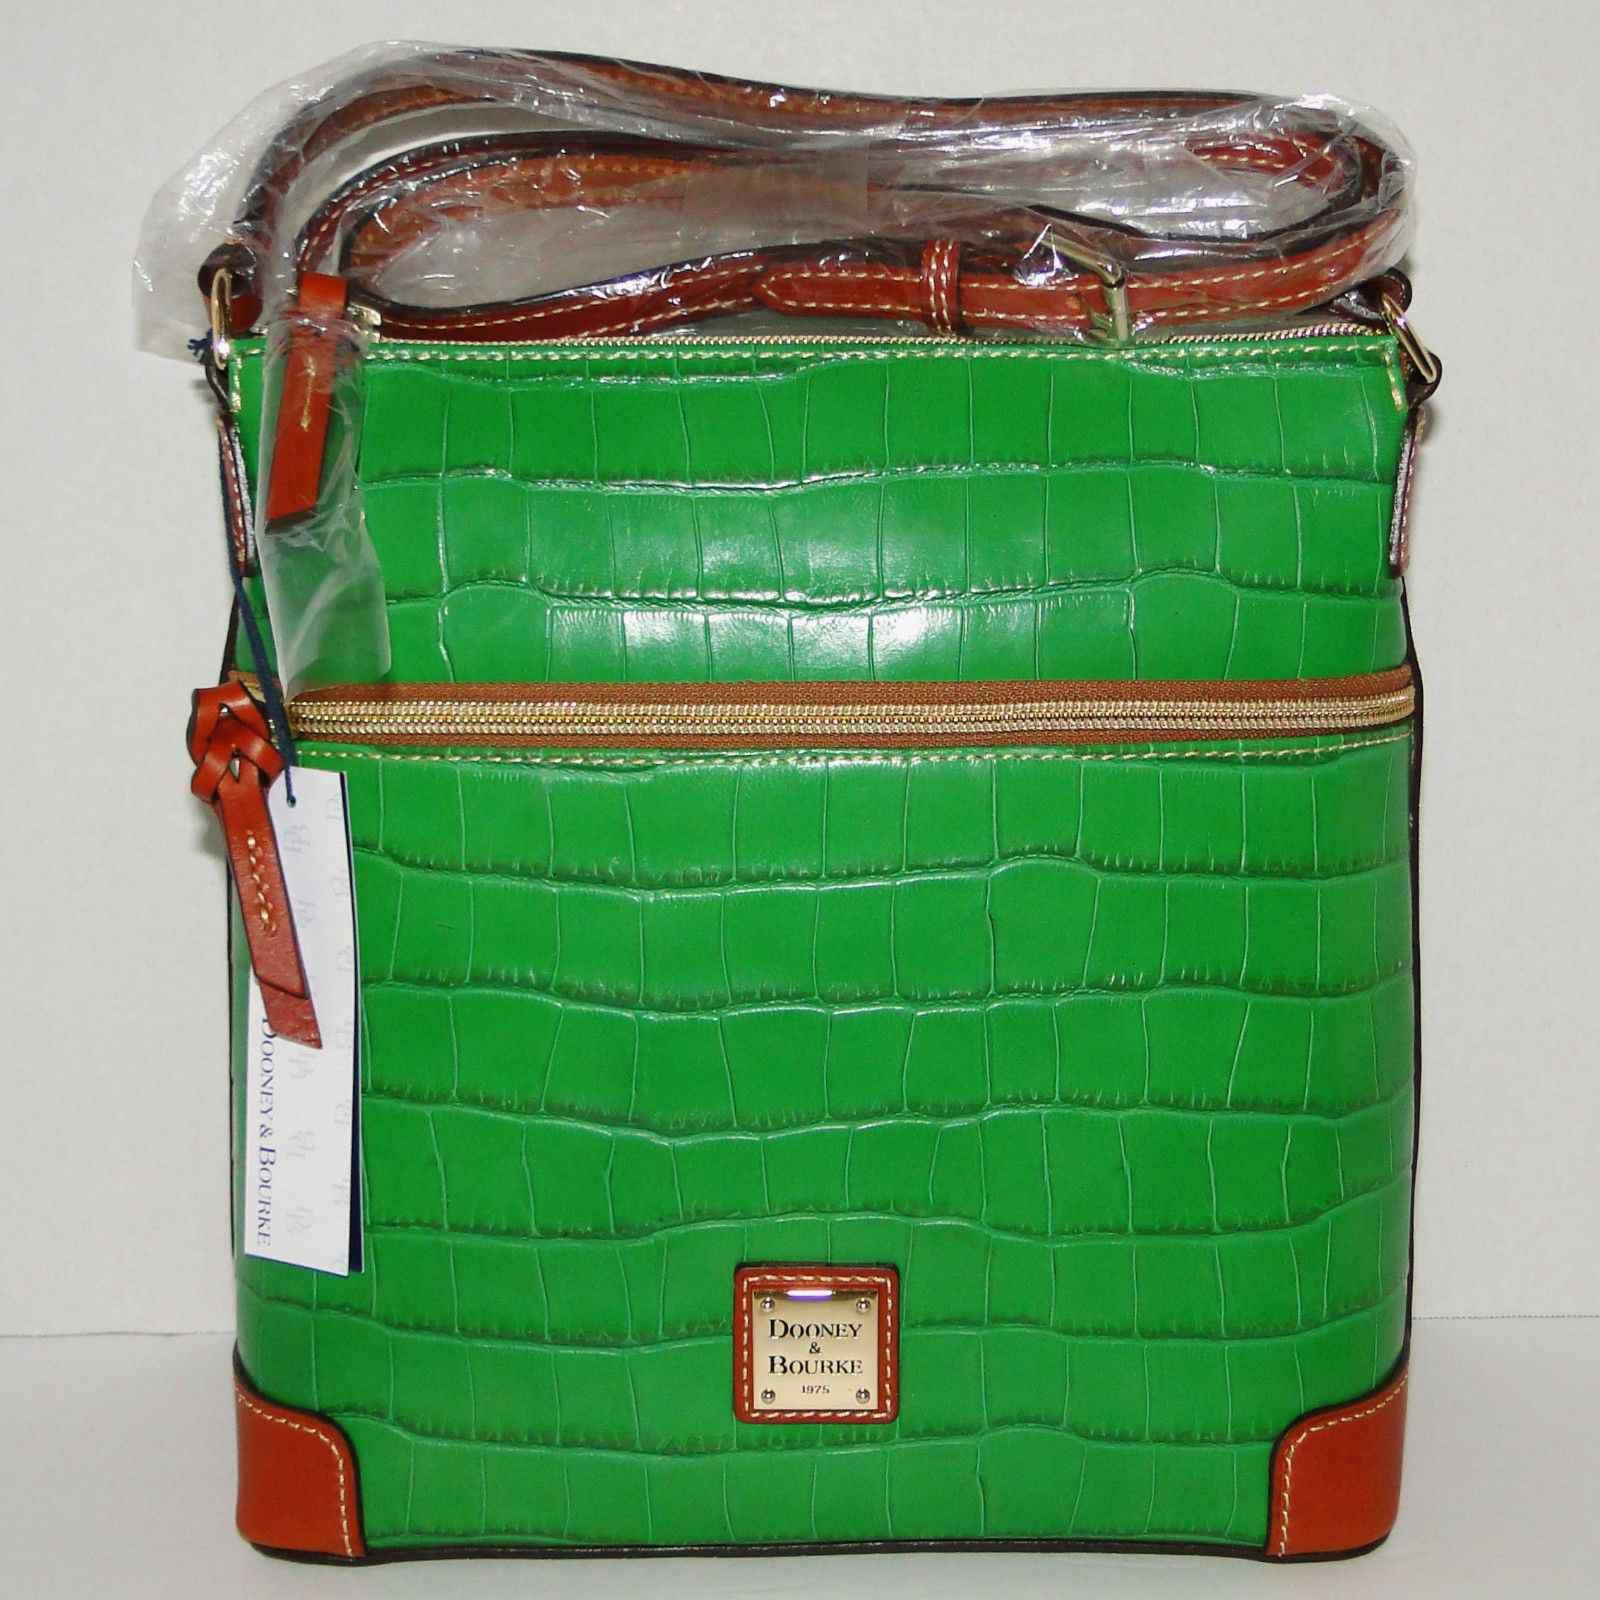 Dooney & Bourke Croco Emb Leather Crossbody Purse Grass Green